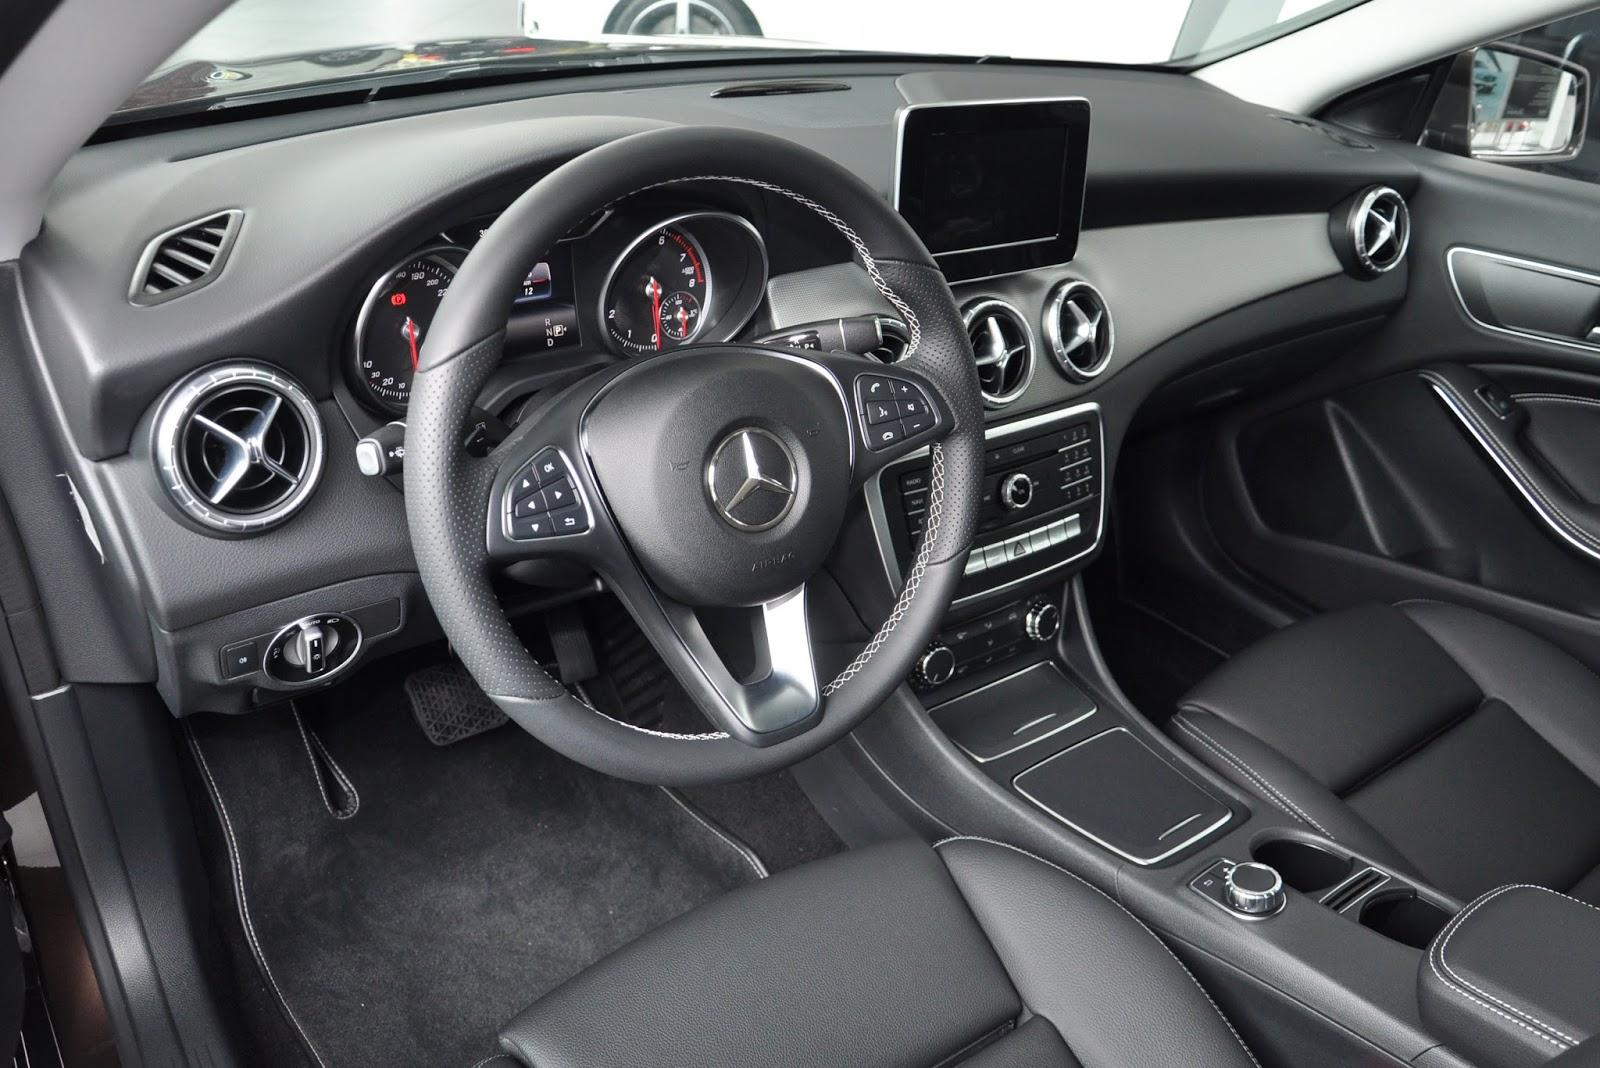 Nội thất xe Mercedes Benz CLA 200 New Model màu nâu 01